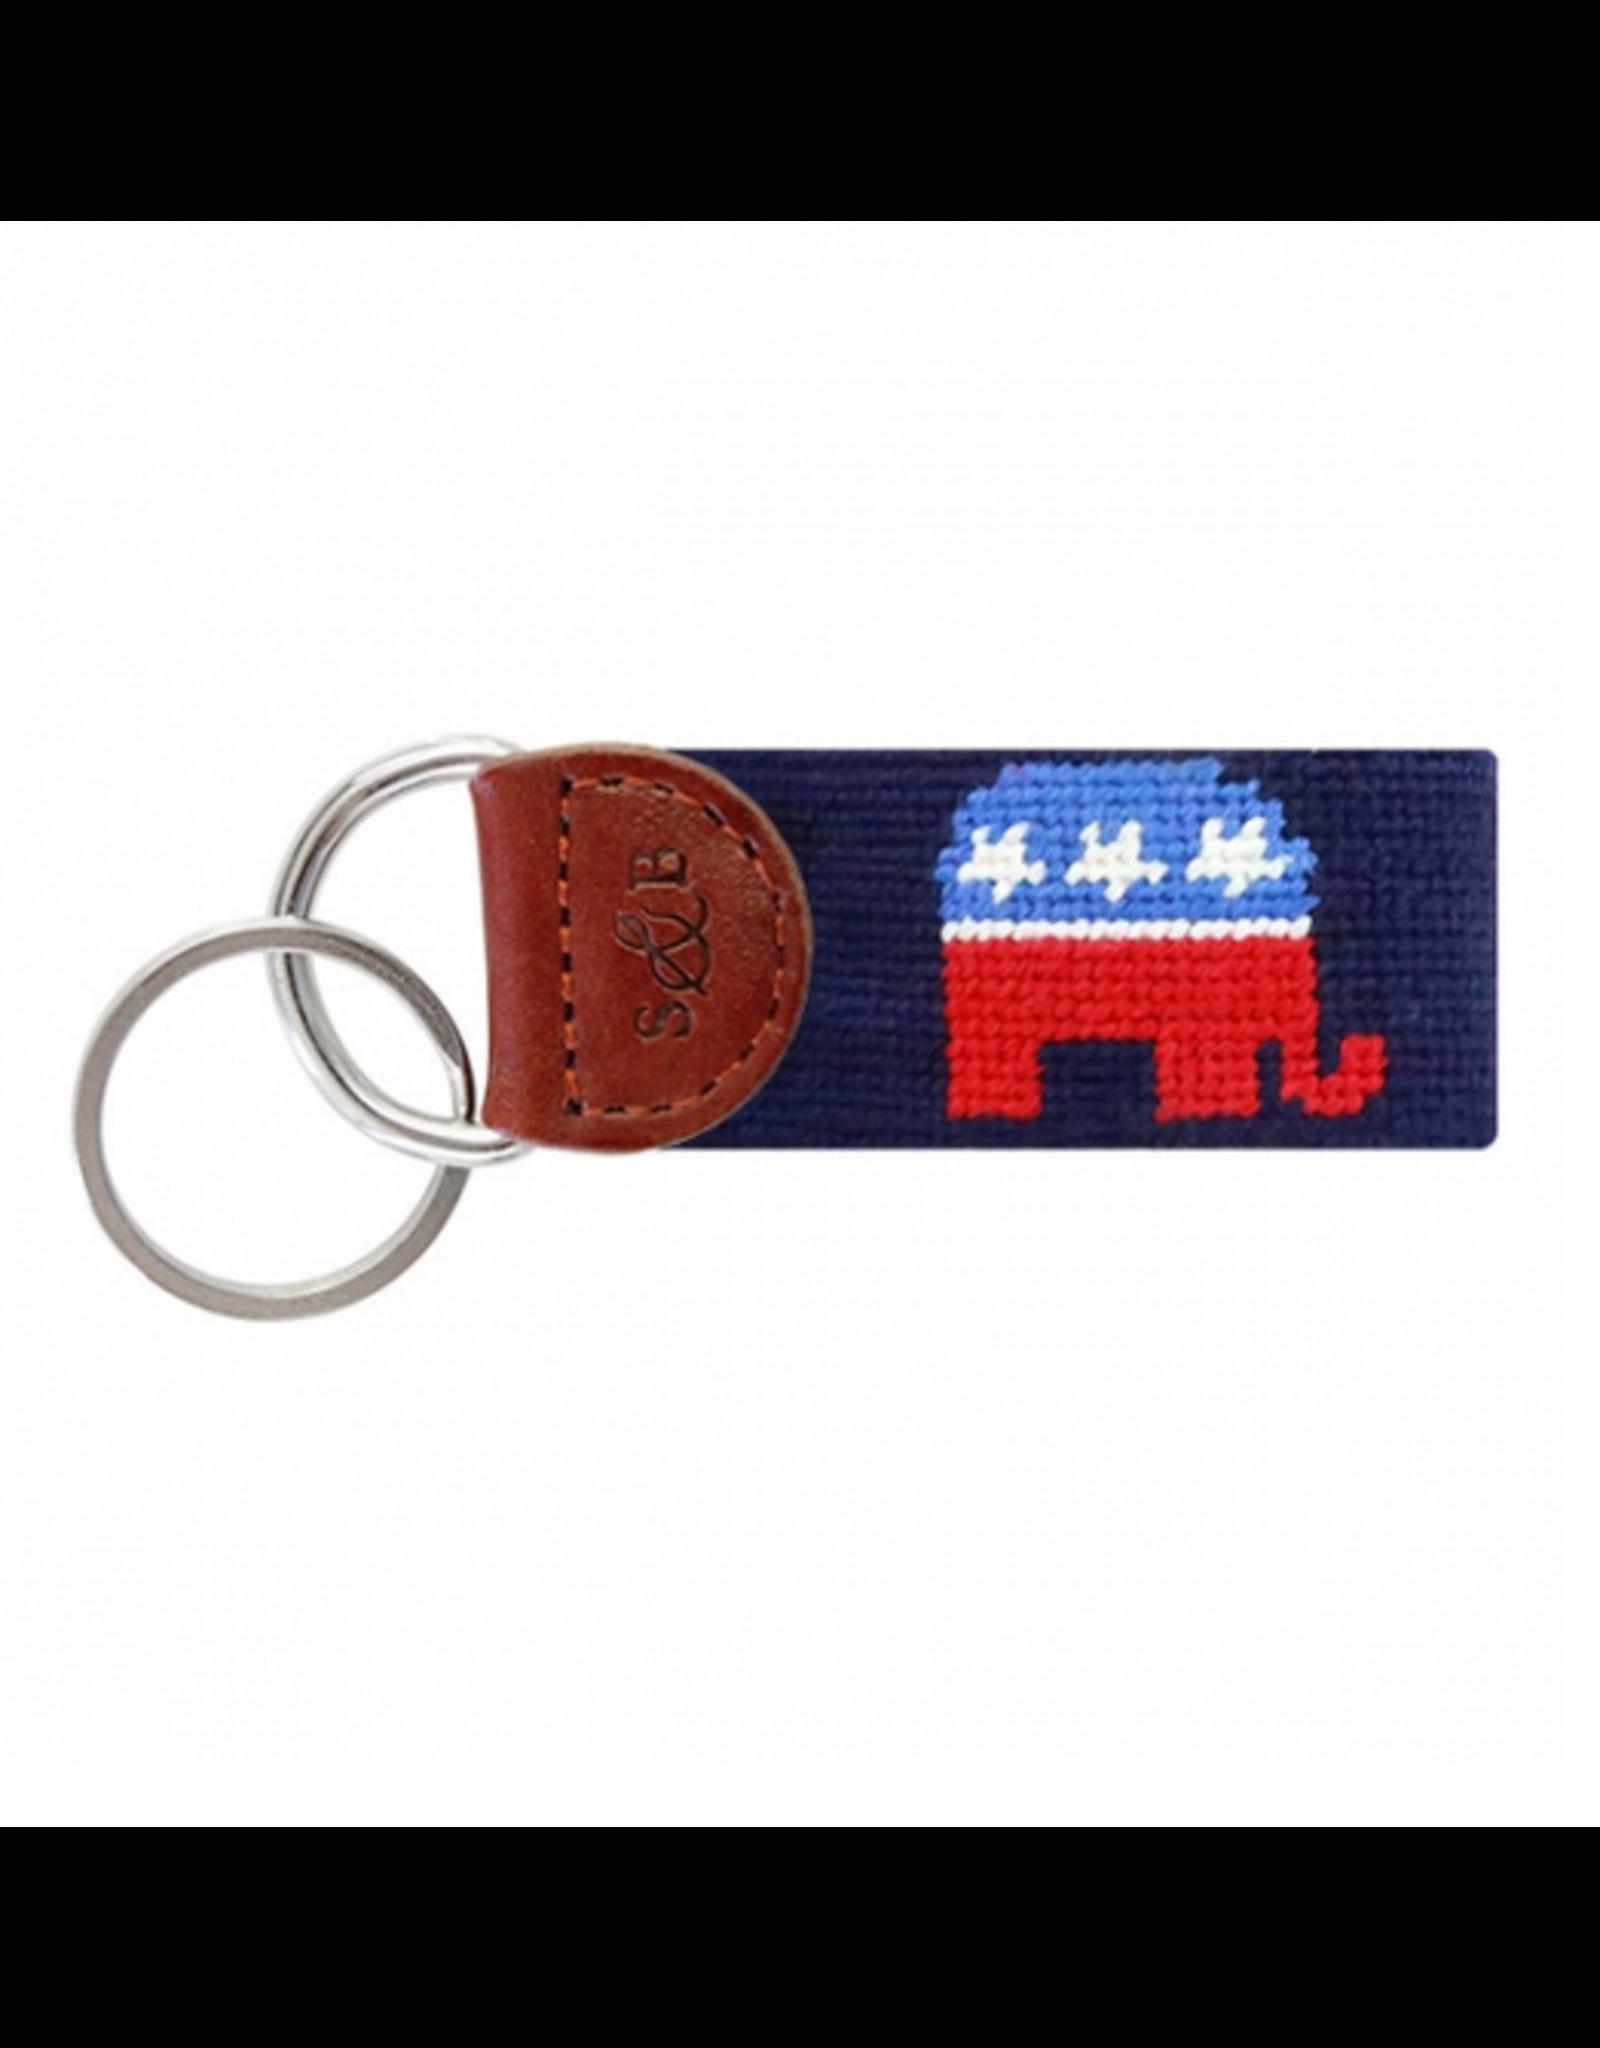 Smathers & Branson S&B Needlepoint Key Fob, Republican Elephant